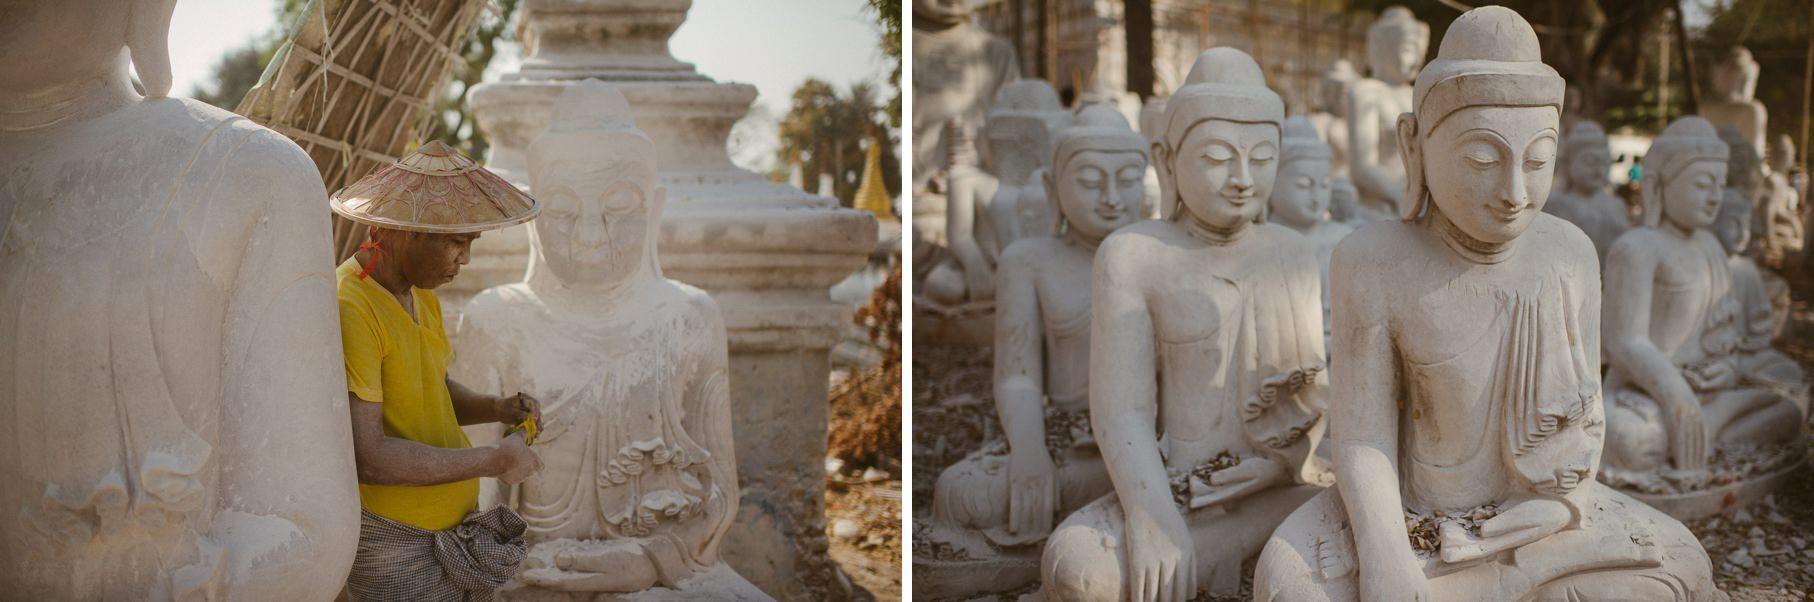 0046 yangon mandalay d76 6892 - Großstädte Myanmars - Yangon & Mandalay